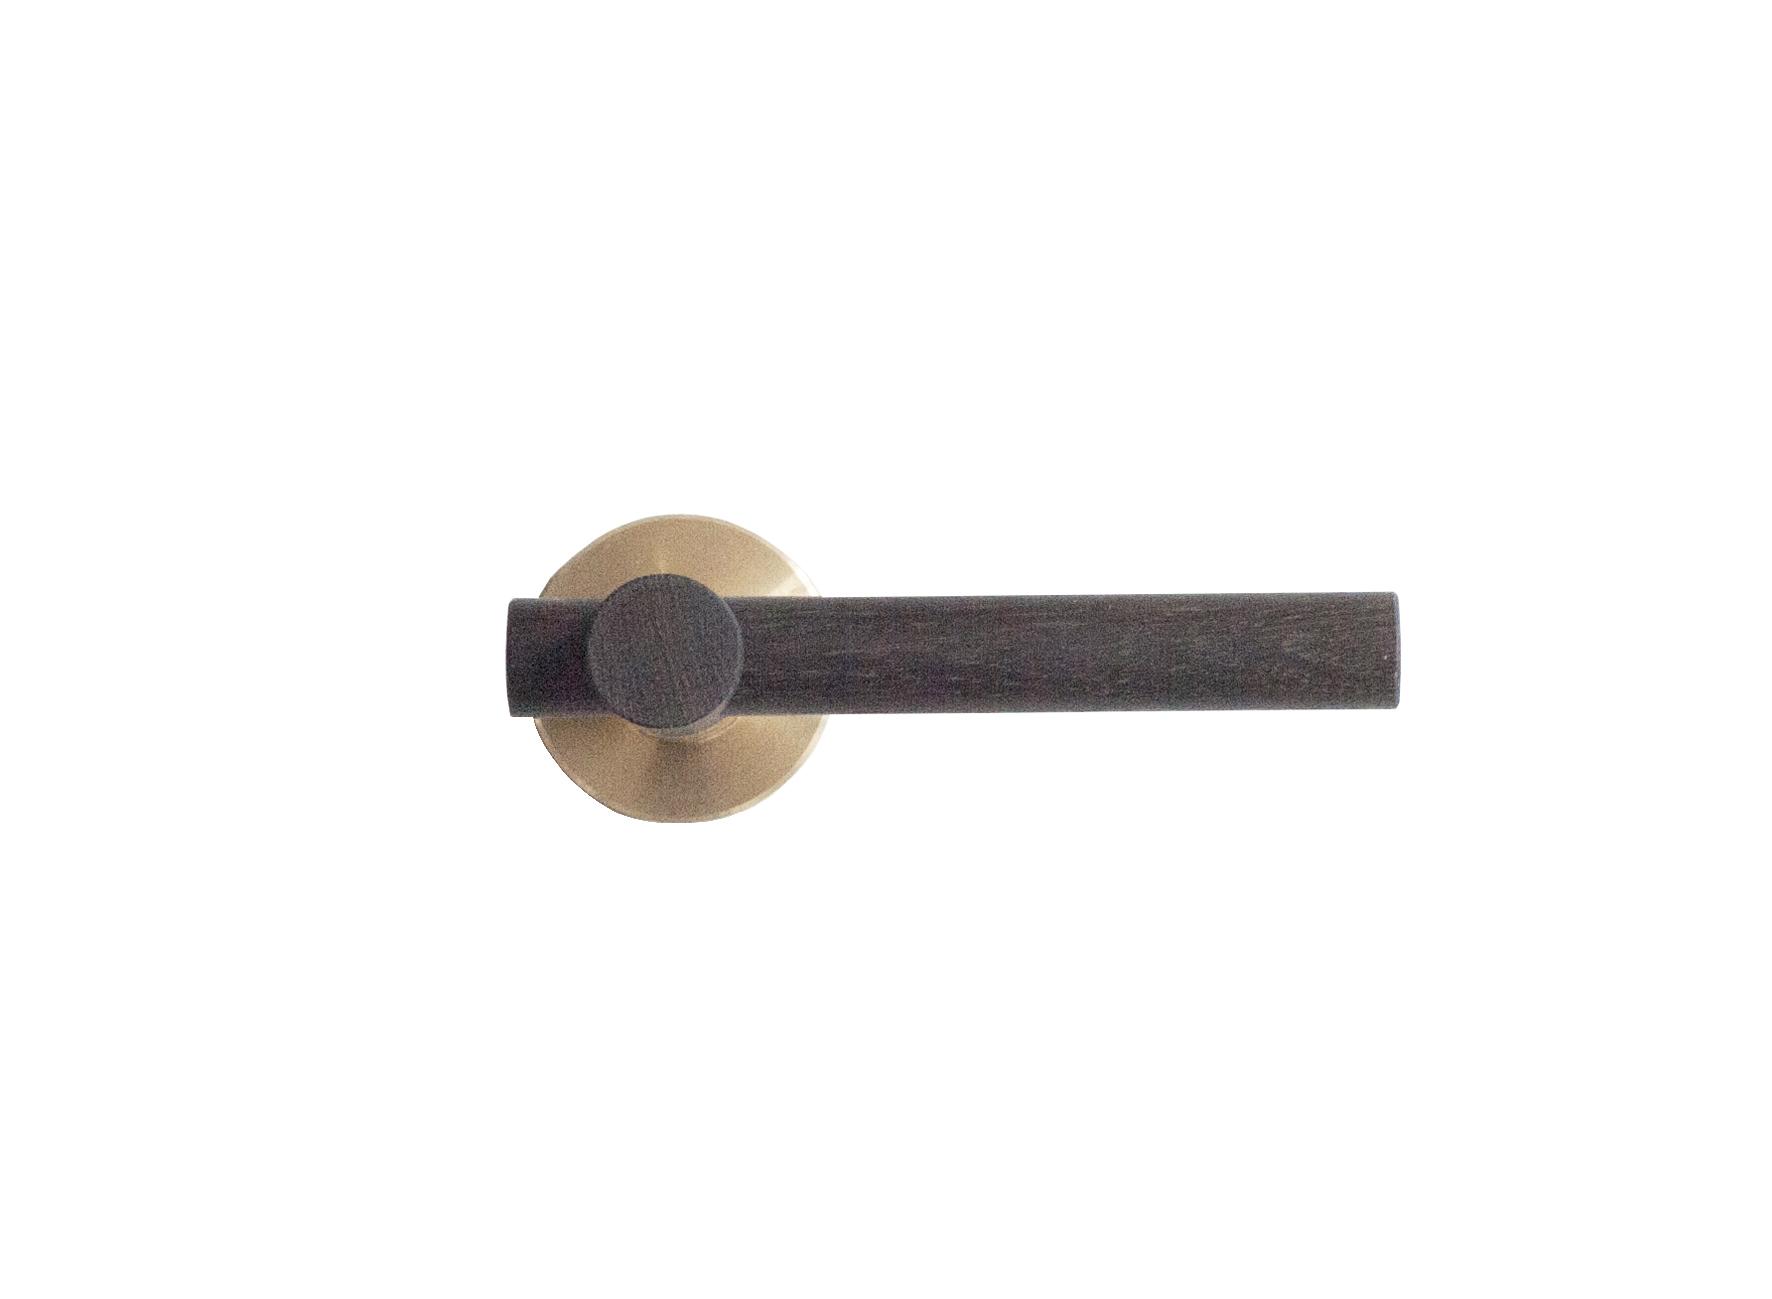 Door handle in fumed oak treated with linseed oil.